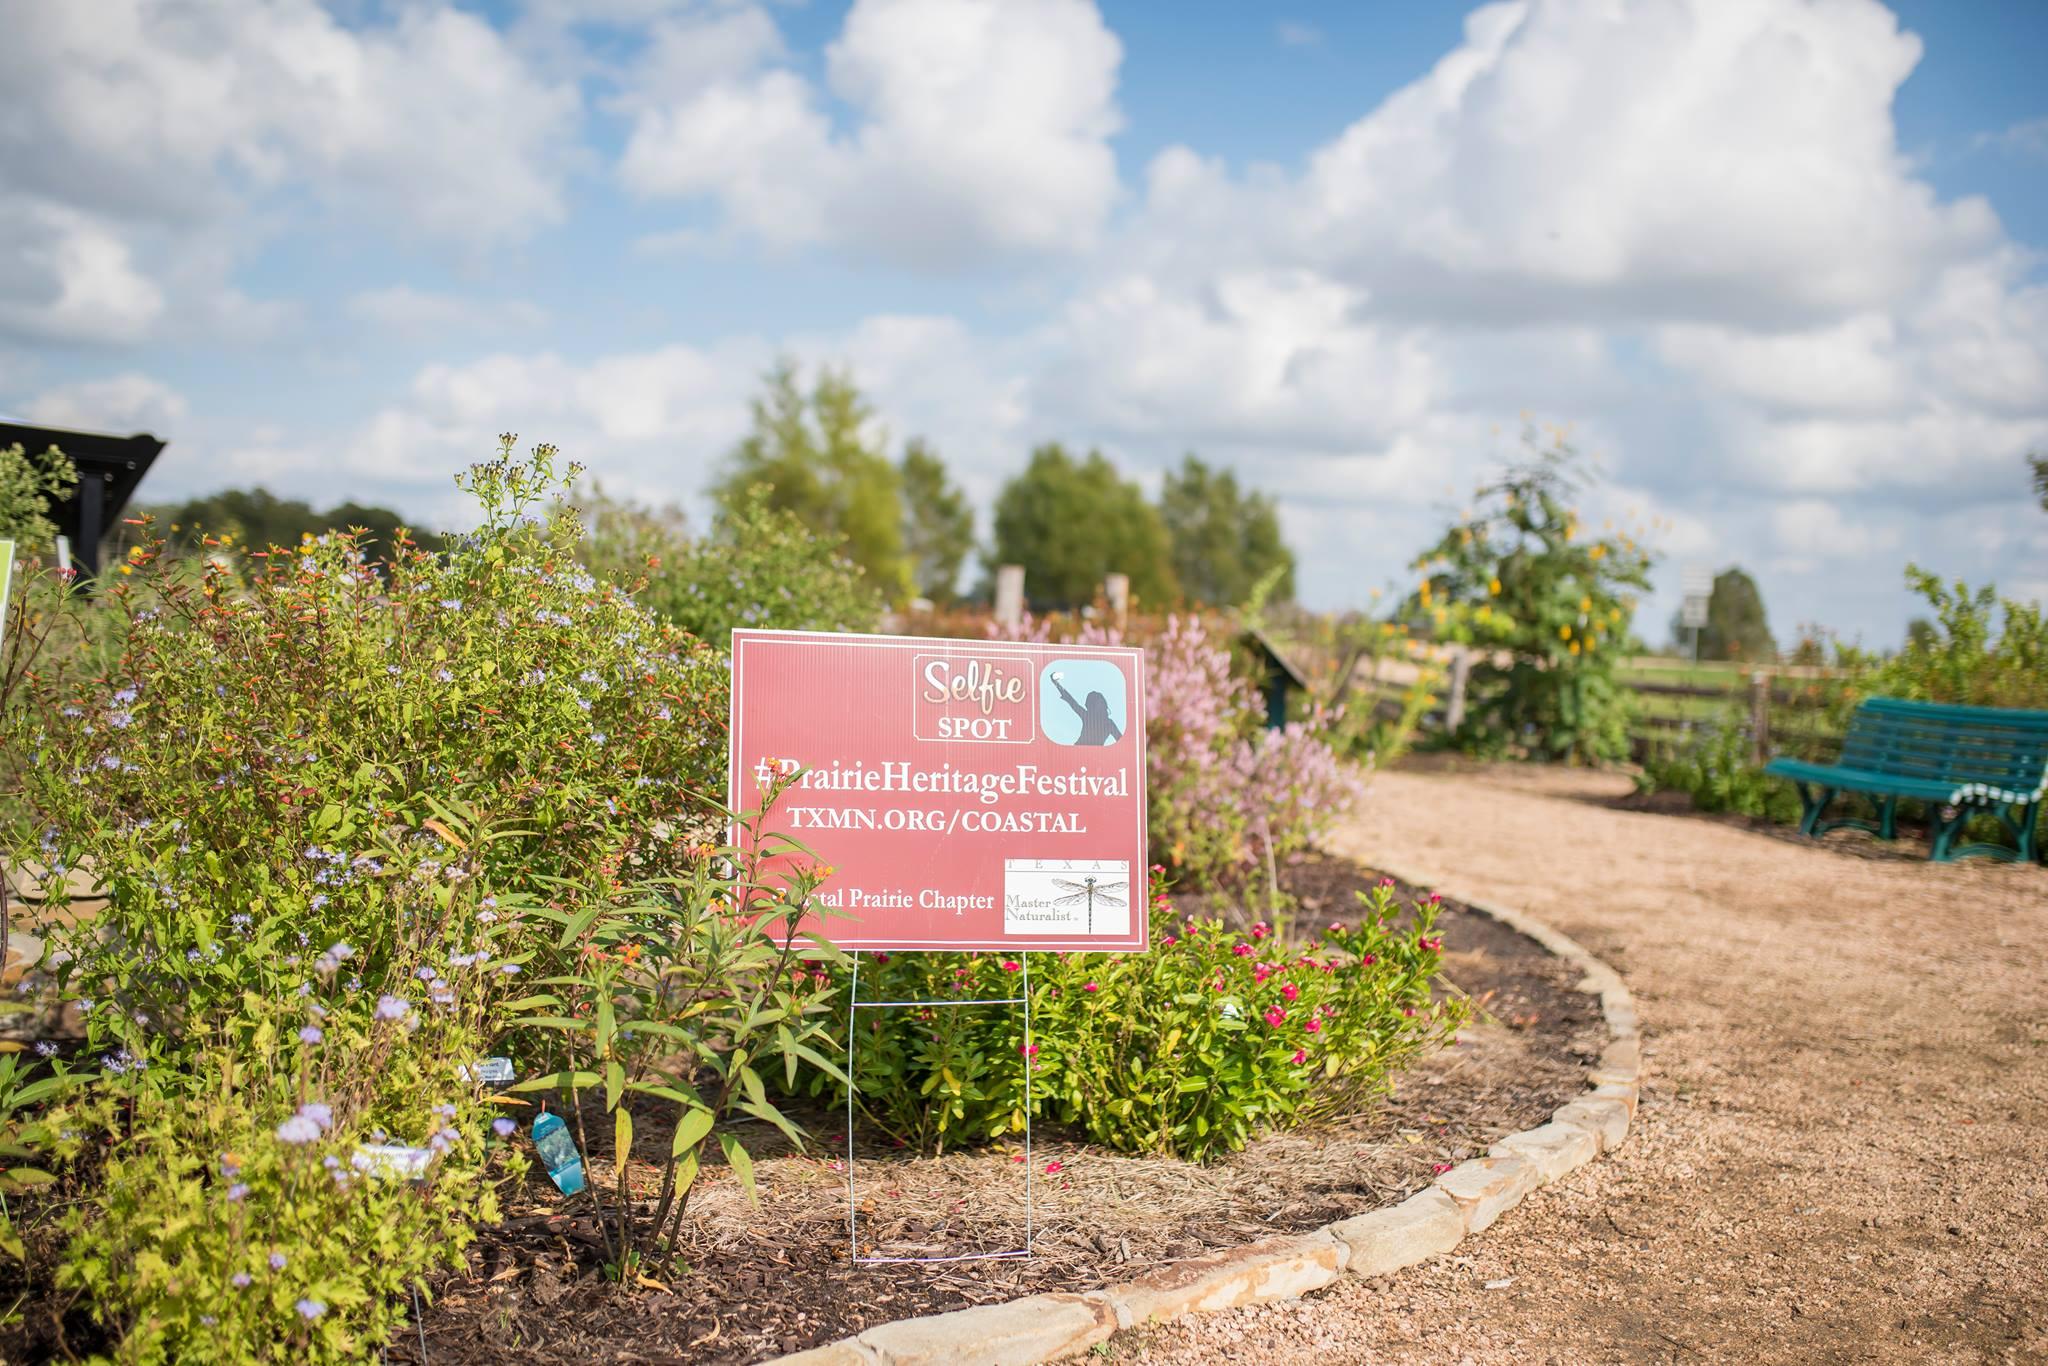 Selfie spot-butterfly garden PHF 2017-RKuykendall